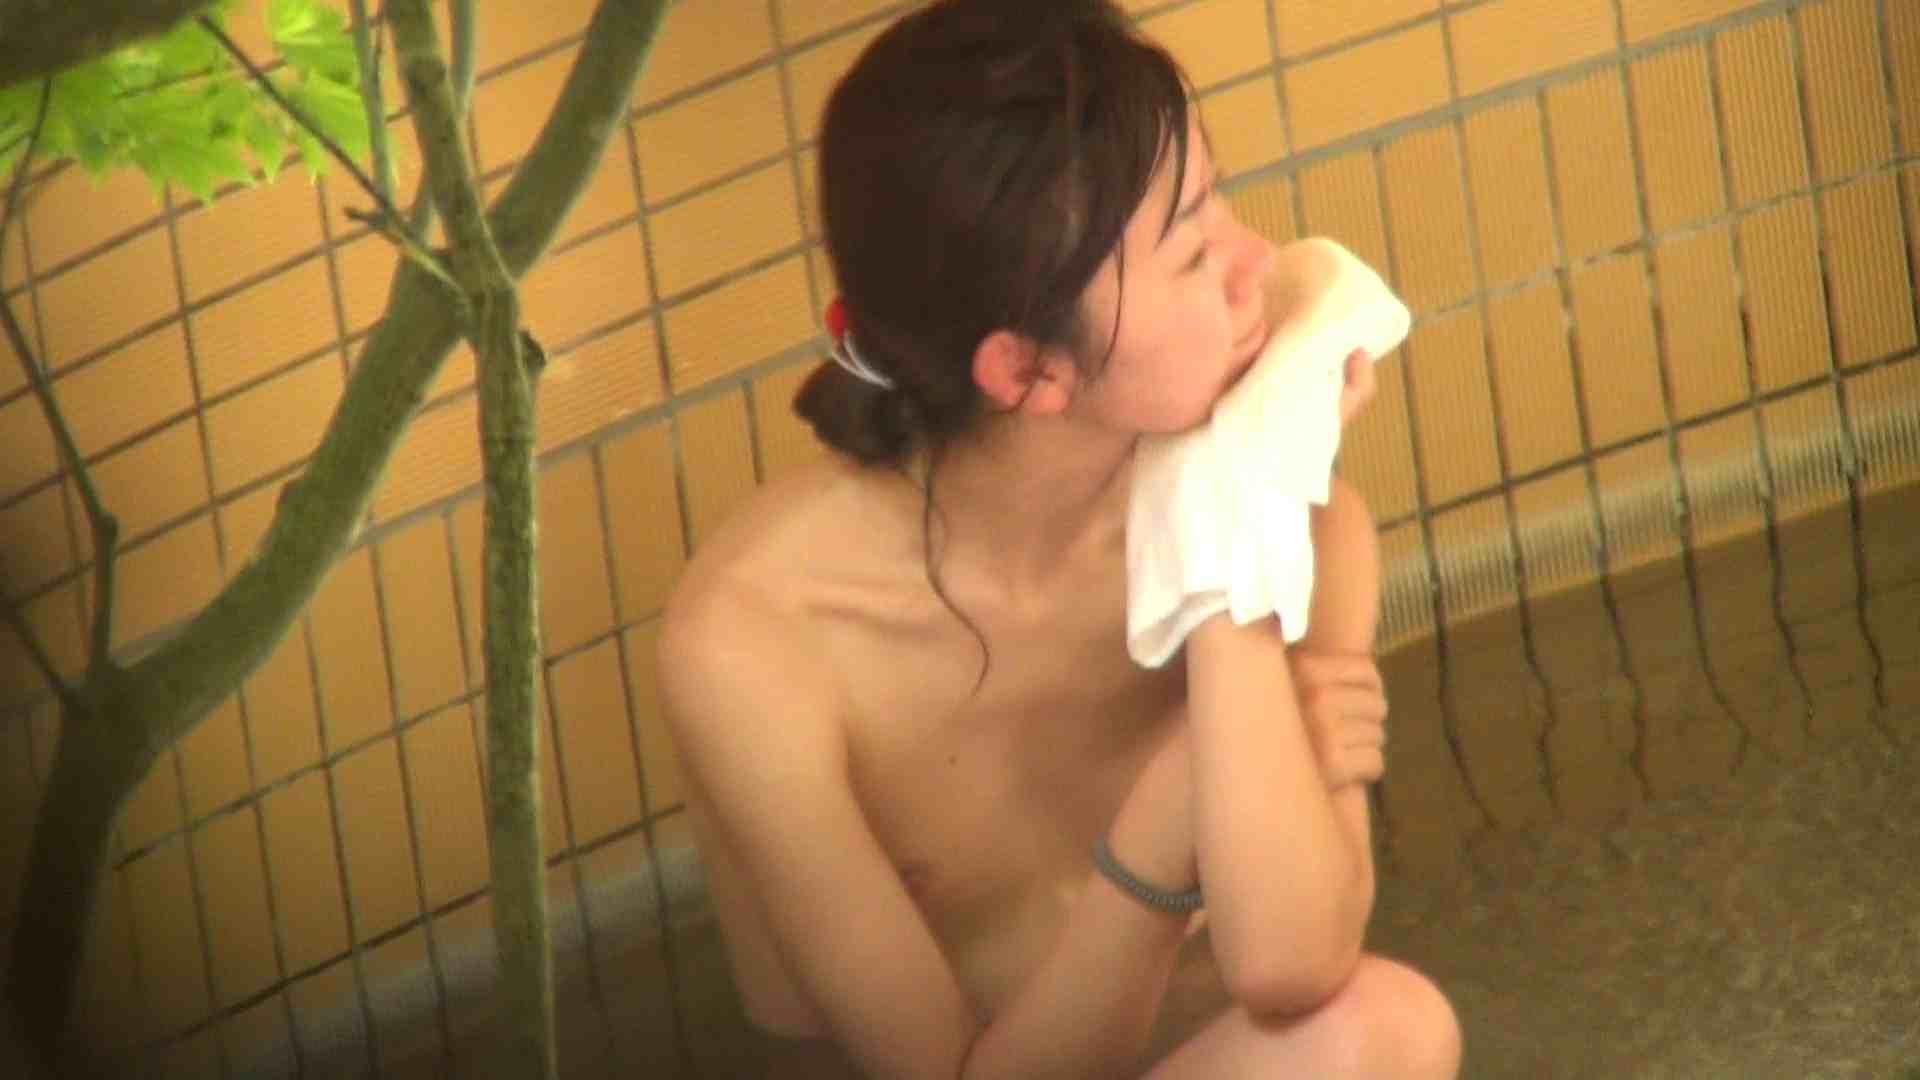 Vol.77 お上品な貧乳色白お女市さまの裸を見る醍醐味 美女 | 貧乳  107枚 13